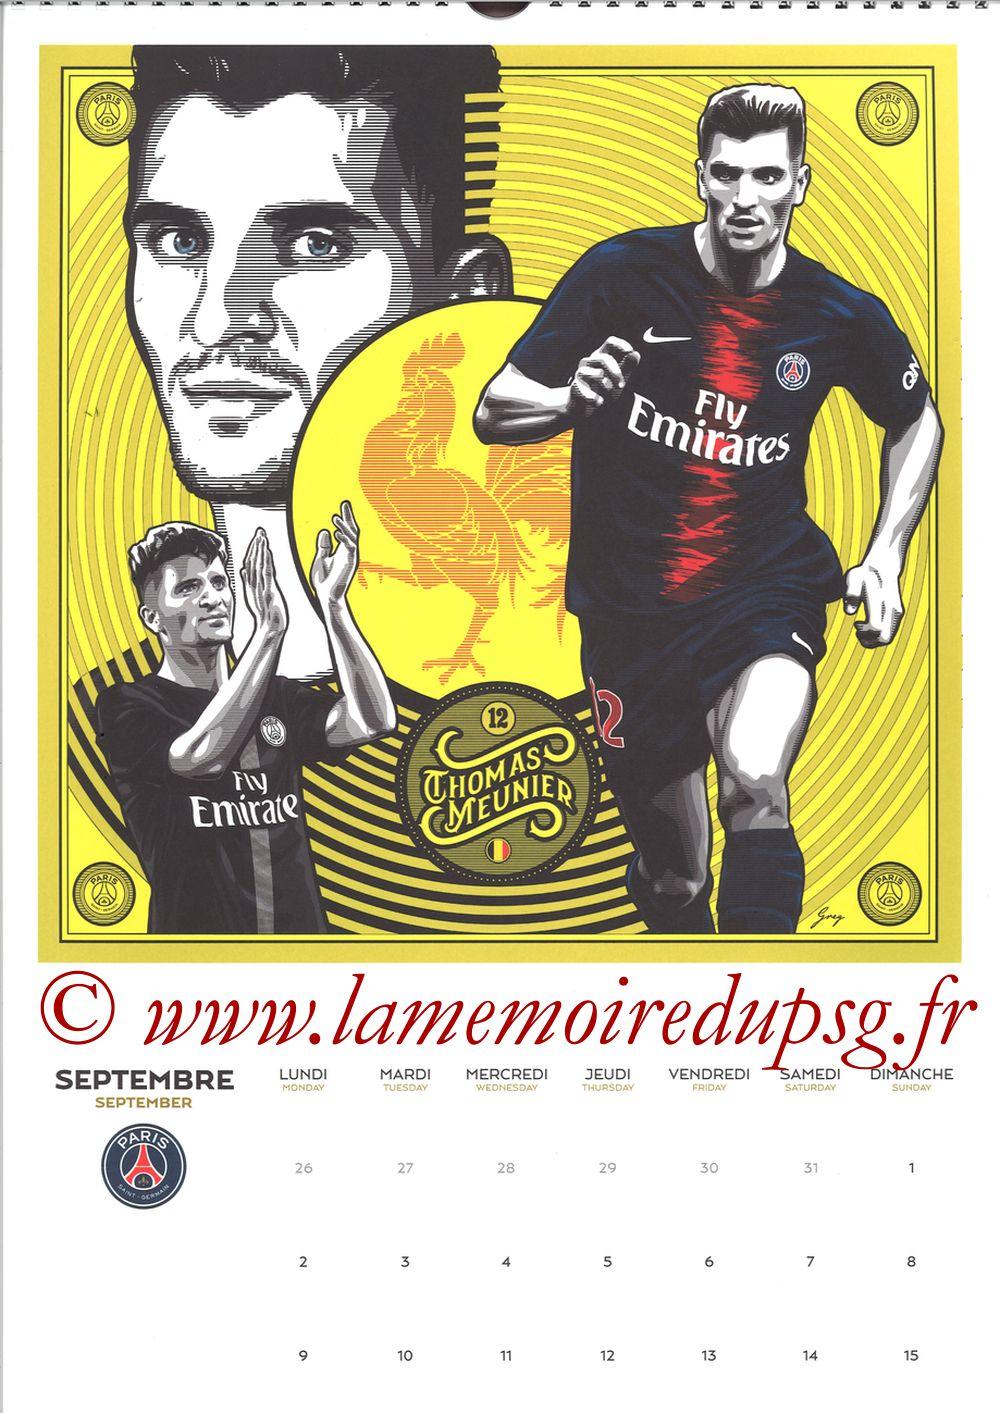 Calendrier PSG 2019 - Page 17 - Thomas MEUNIER